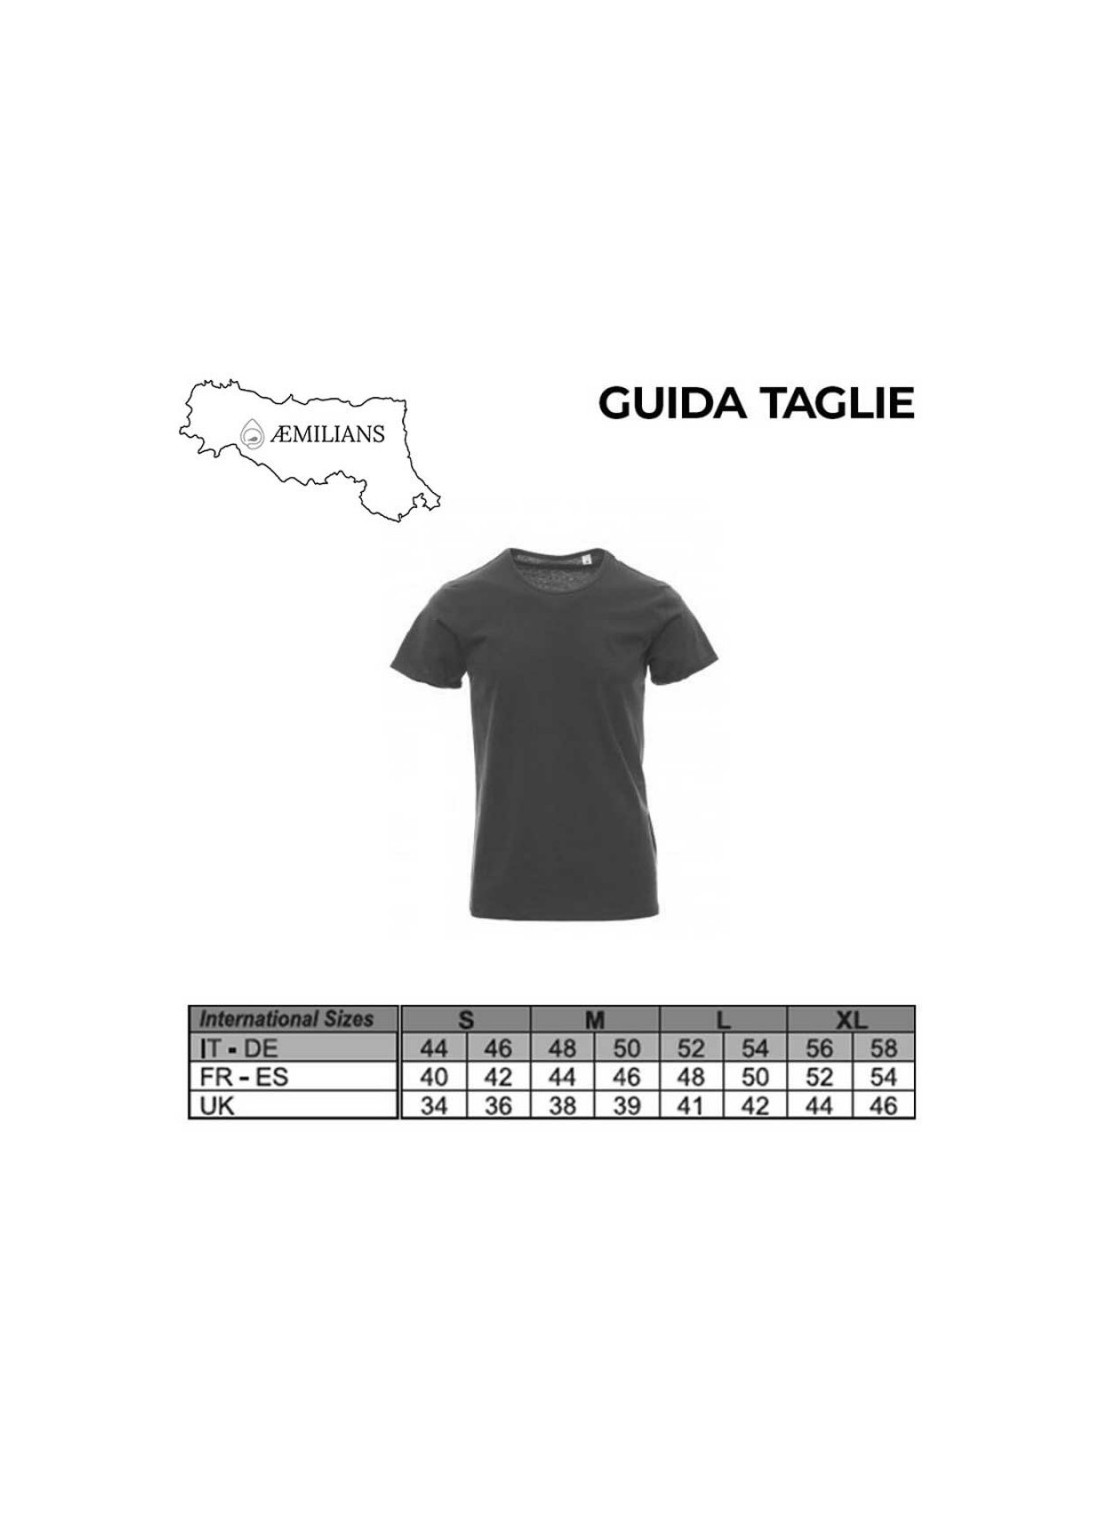 T-shirt Campionato italiano unisex bianca